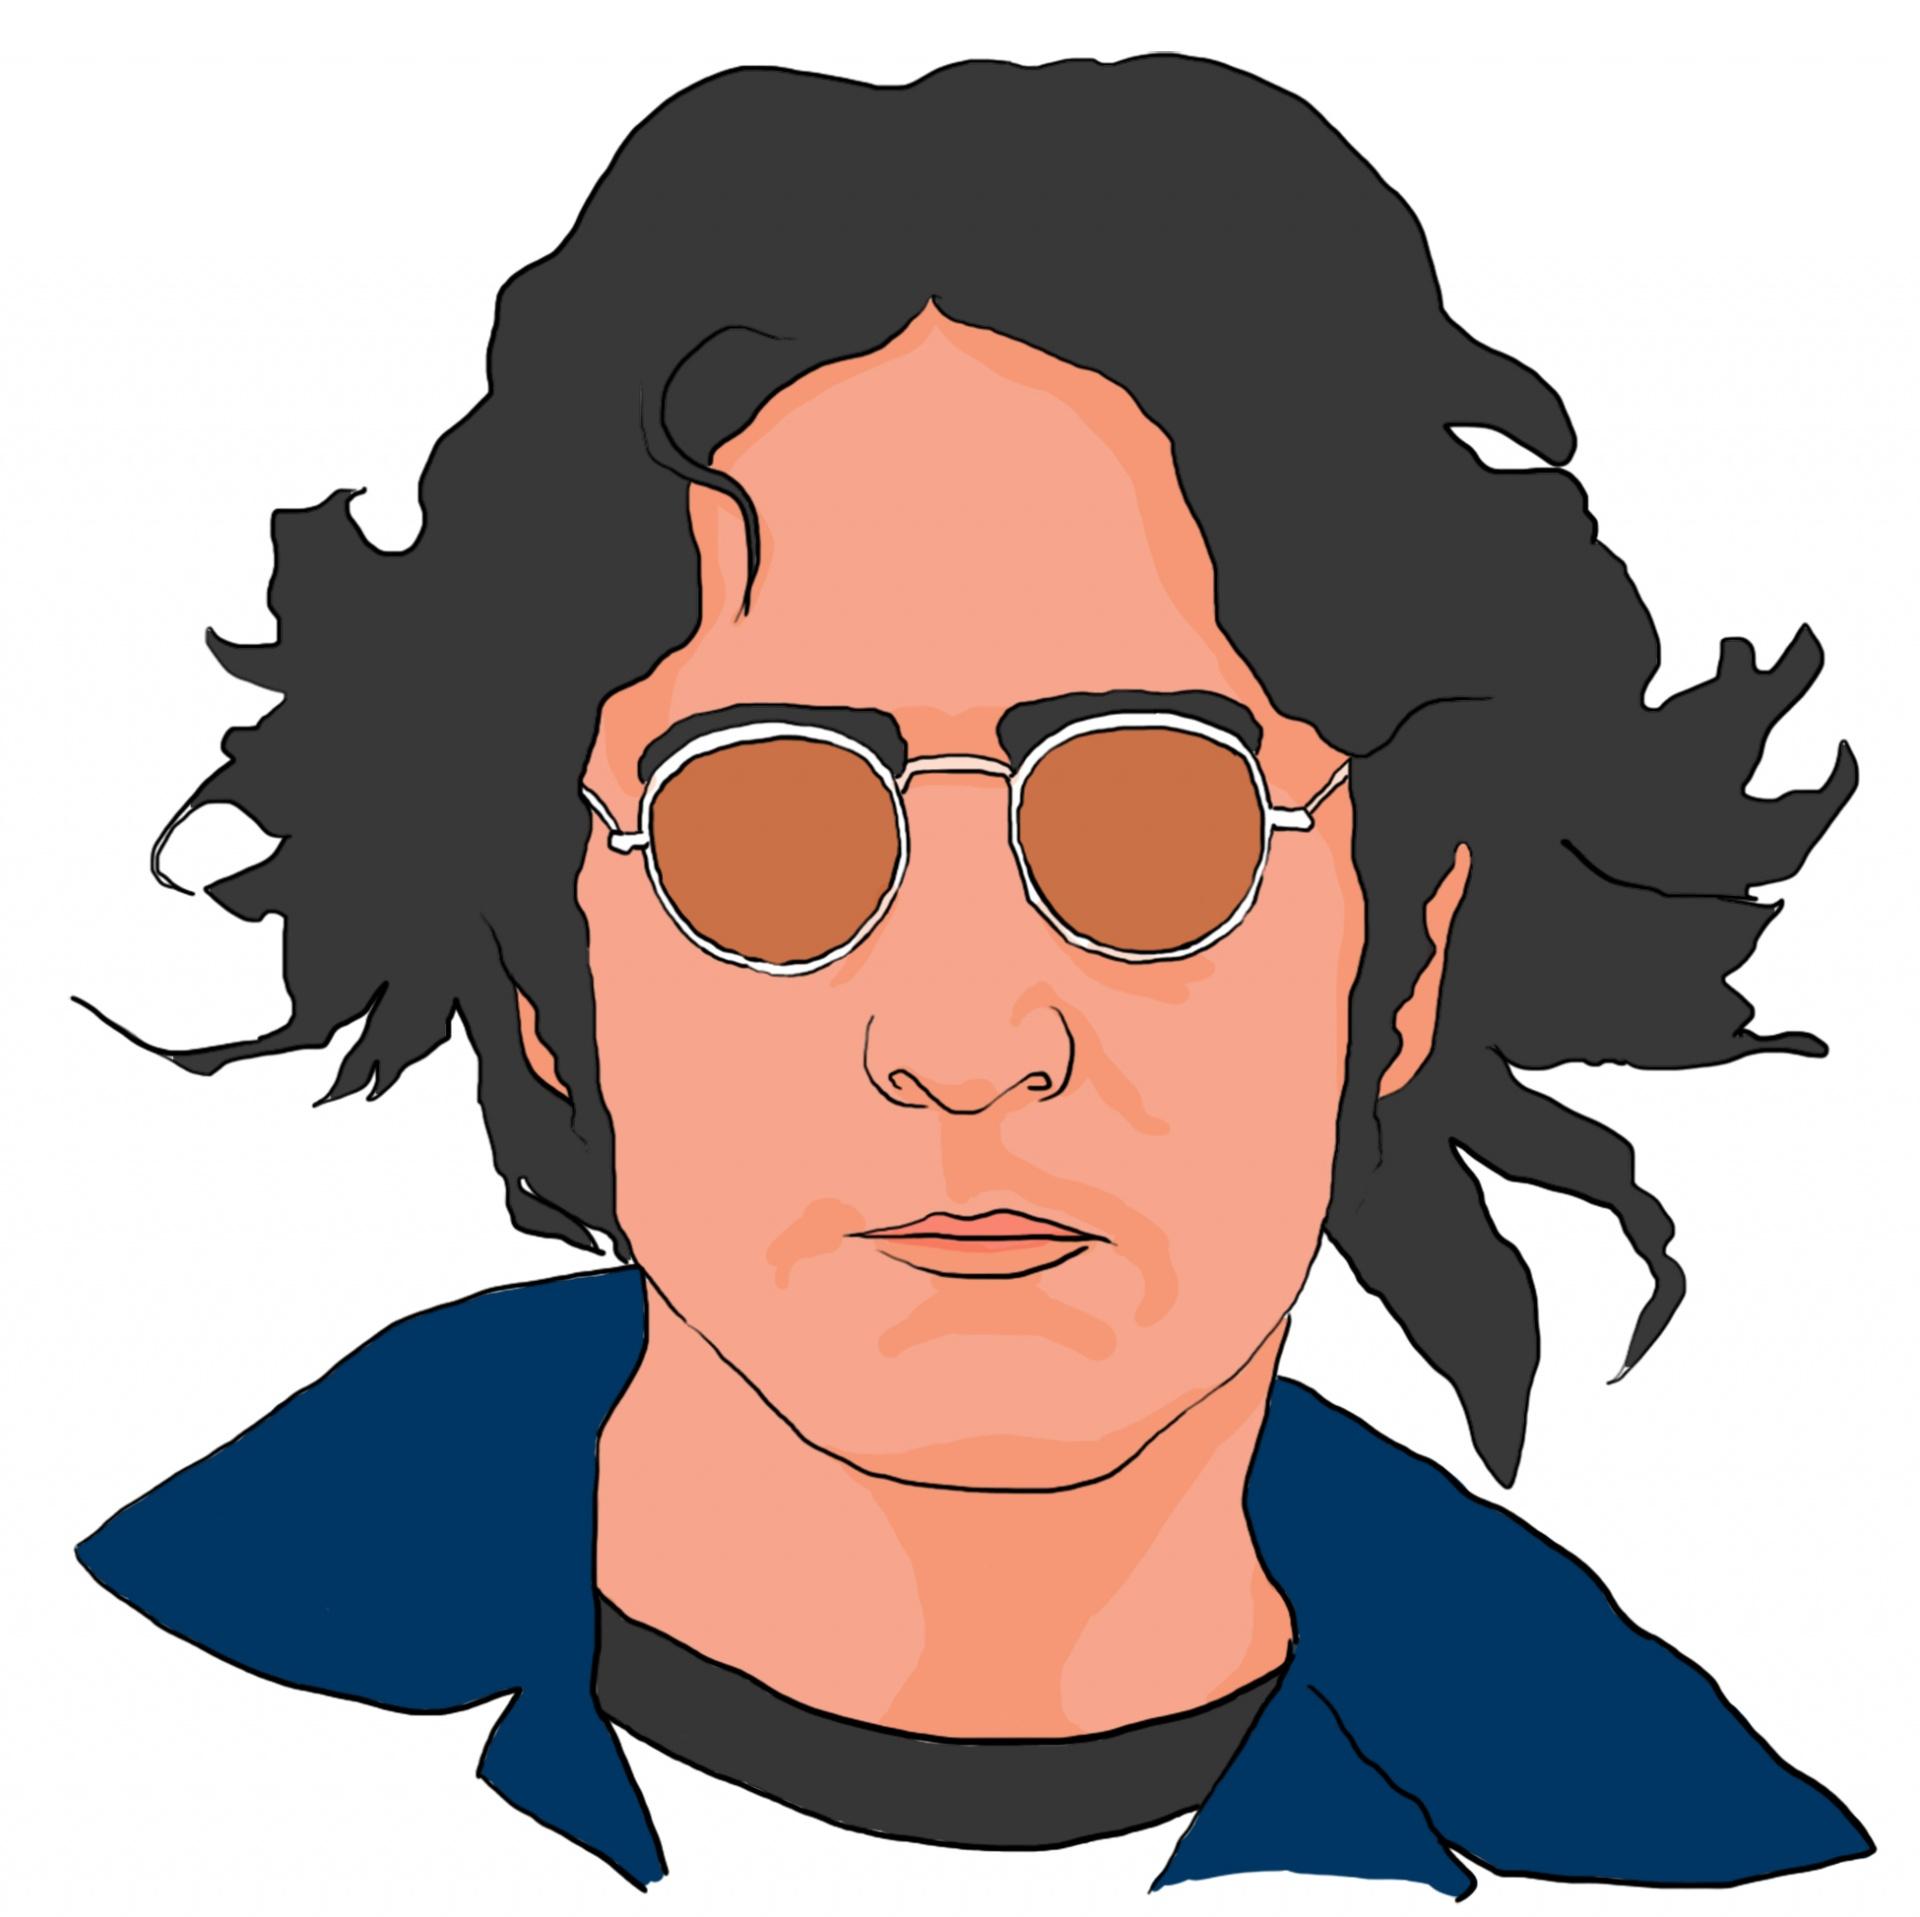 John Lennon Clipart Free Stock Photo.